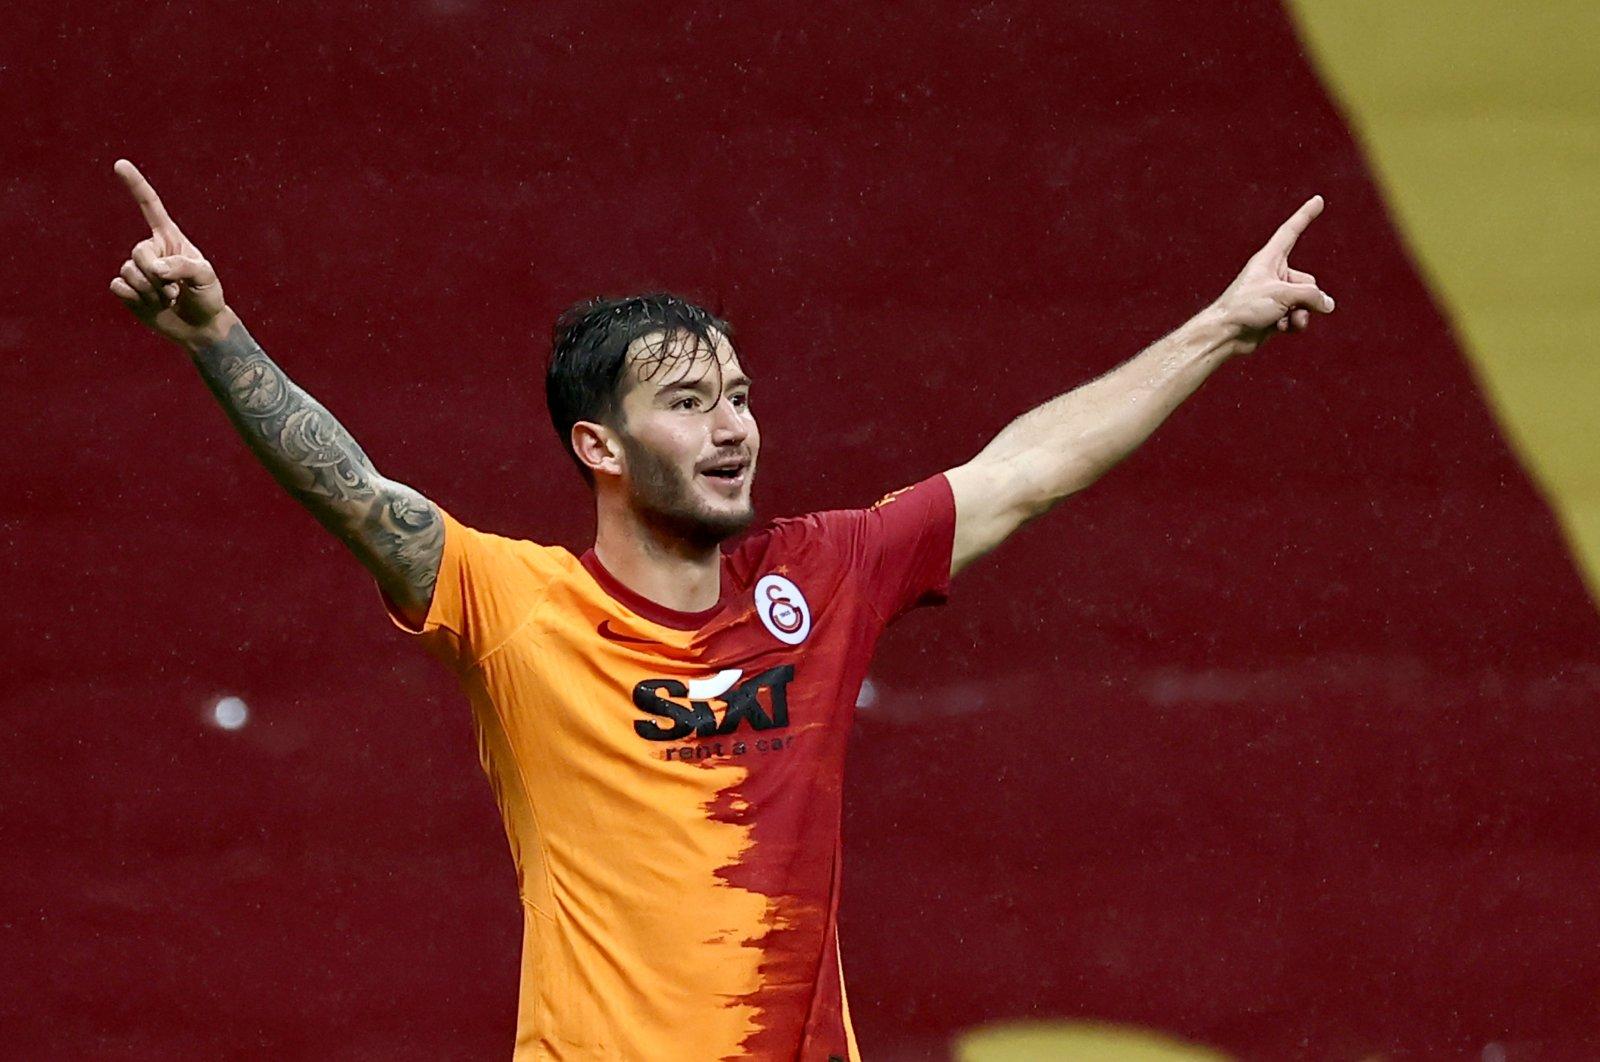 Galatasaray's Oğulcan Çağlayan reacts after scoring a goal during a Süper Lig match against Gençlerbirliği at the Türk Telekom Arena stadium, in Istanbul, Turkey, Jan. 9, 2021. (AA Photo)